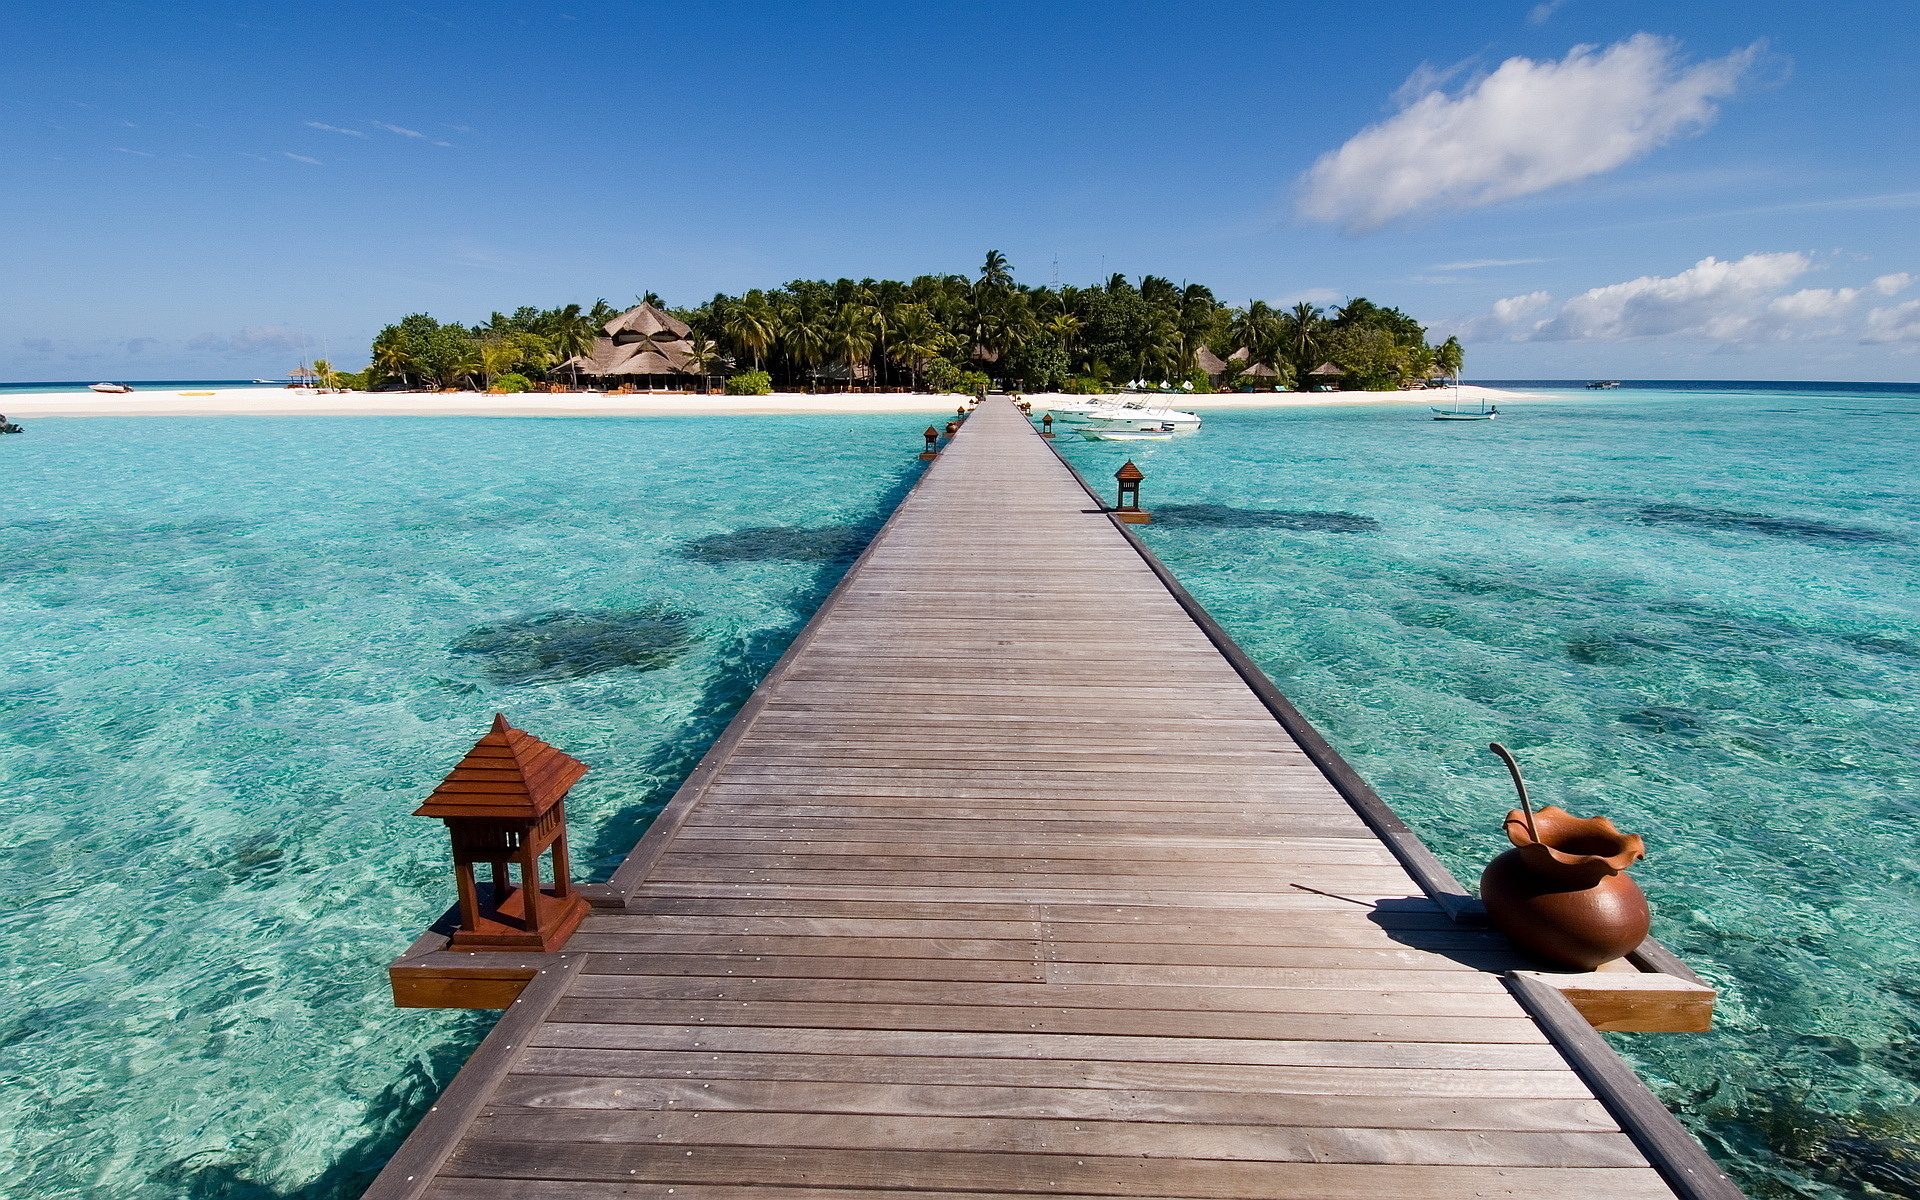 Bridge Tropical Island